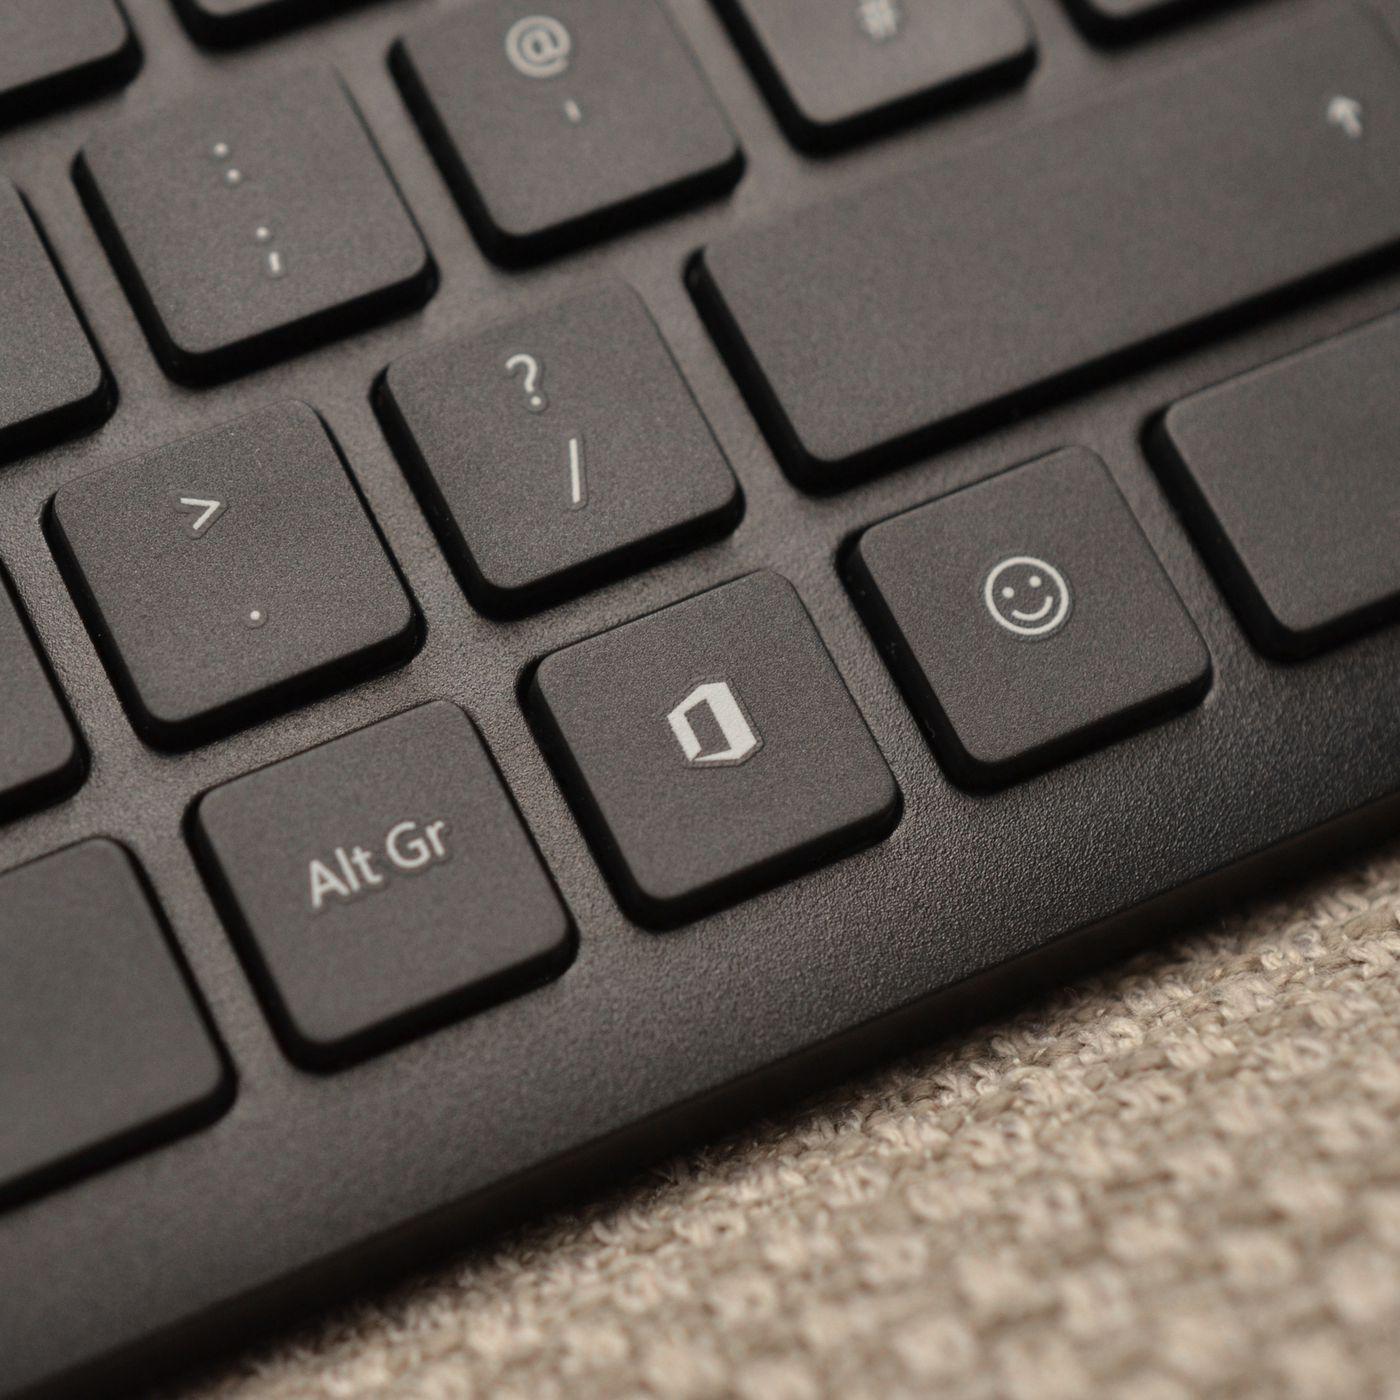 theverge.com - Tom Warren - Microsoft has put dedicated Office and emoji keys on its new keyboards